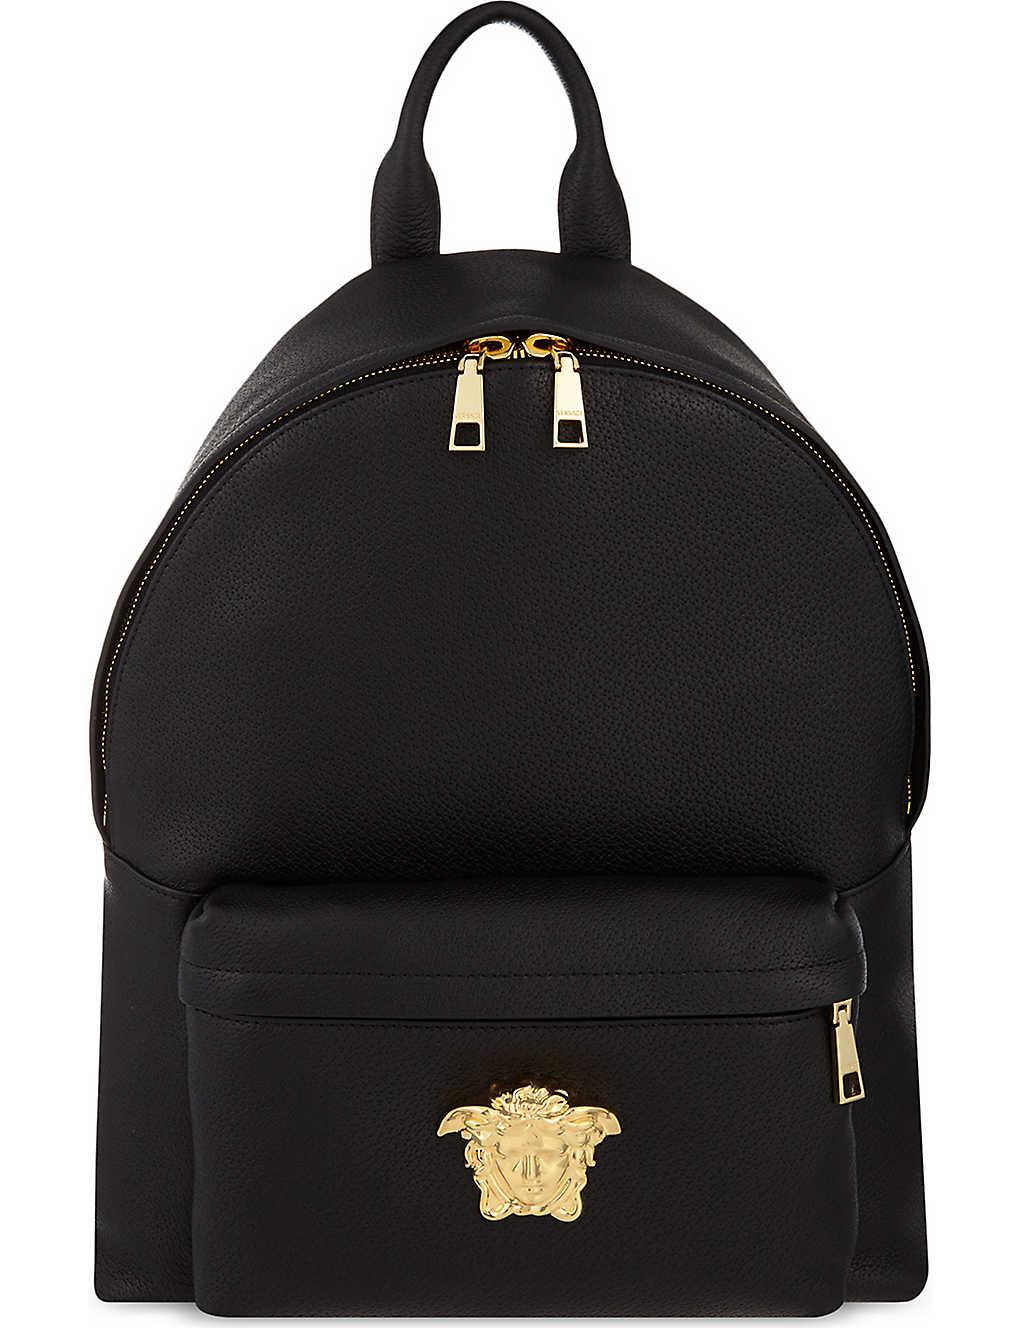 954f8d6aed2 VERSACE - Medusa leather backpack | Selfridges.com